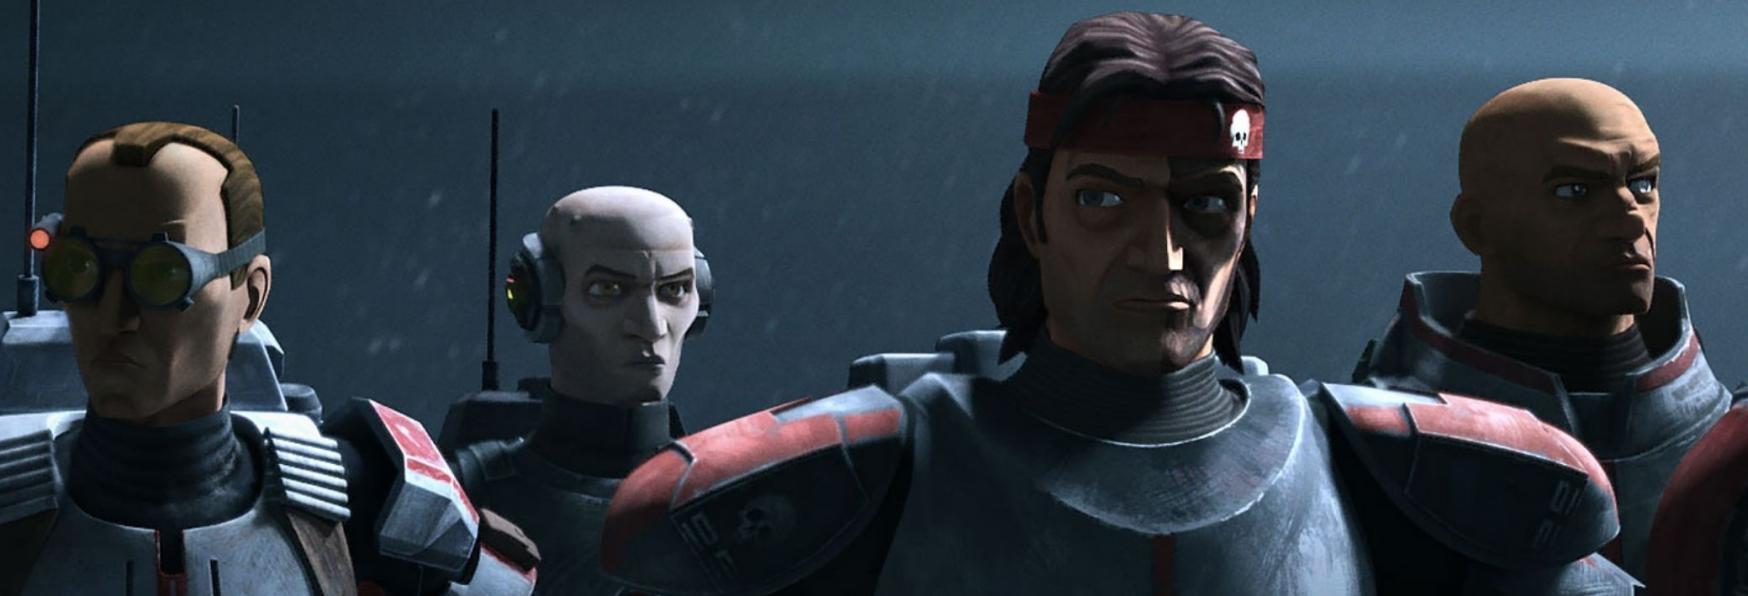 Star Wars: The Bad Batch - la Premiere avrà una Durata di 70 minuti